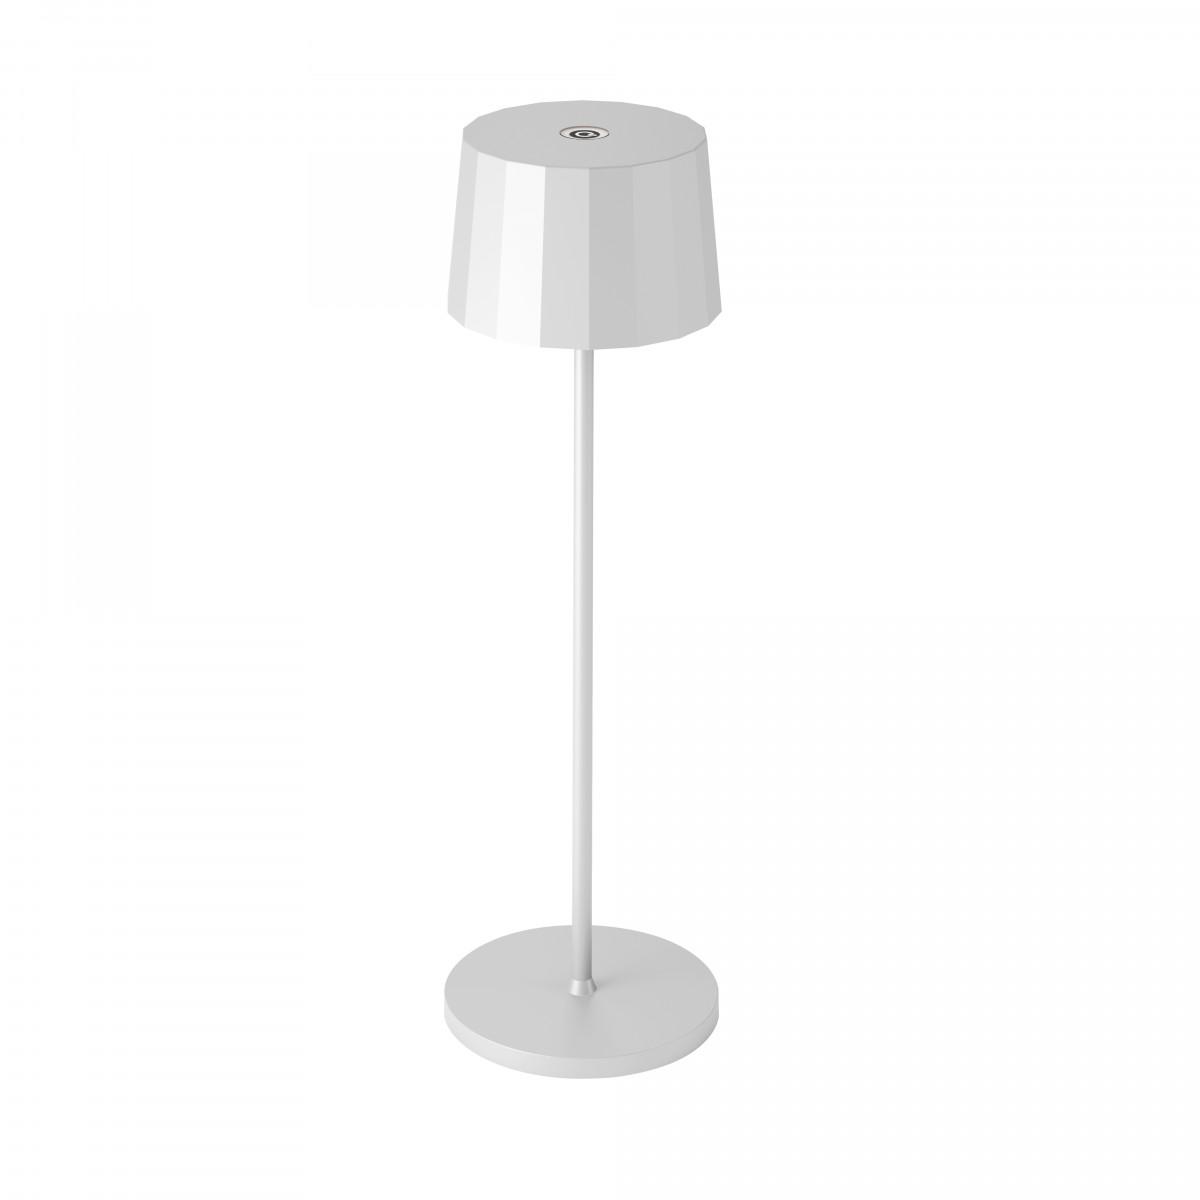 Tafellamp Lido Touch wit met USB